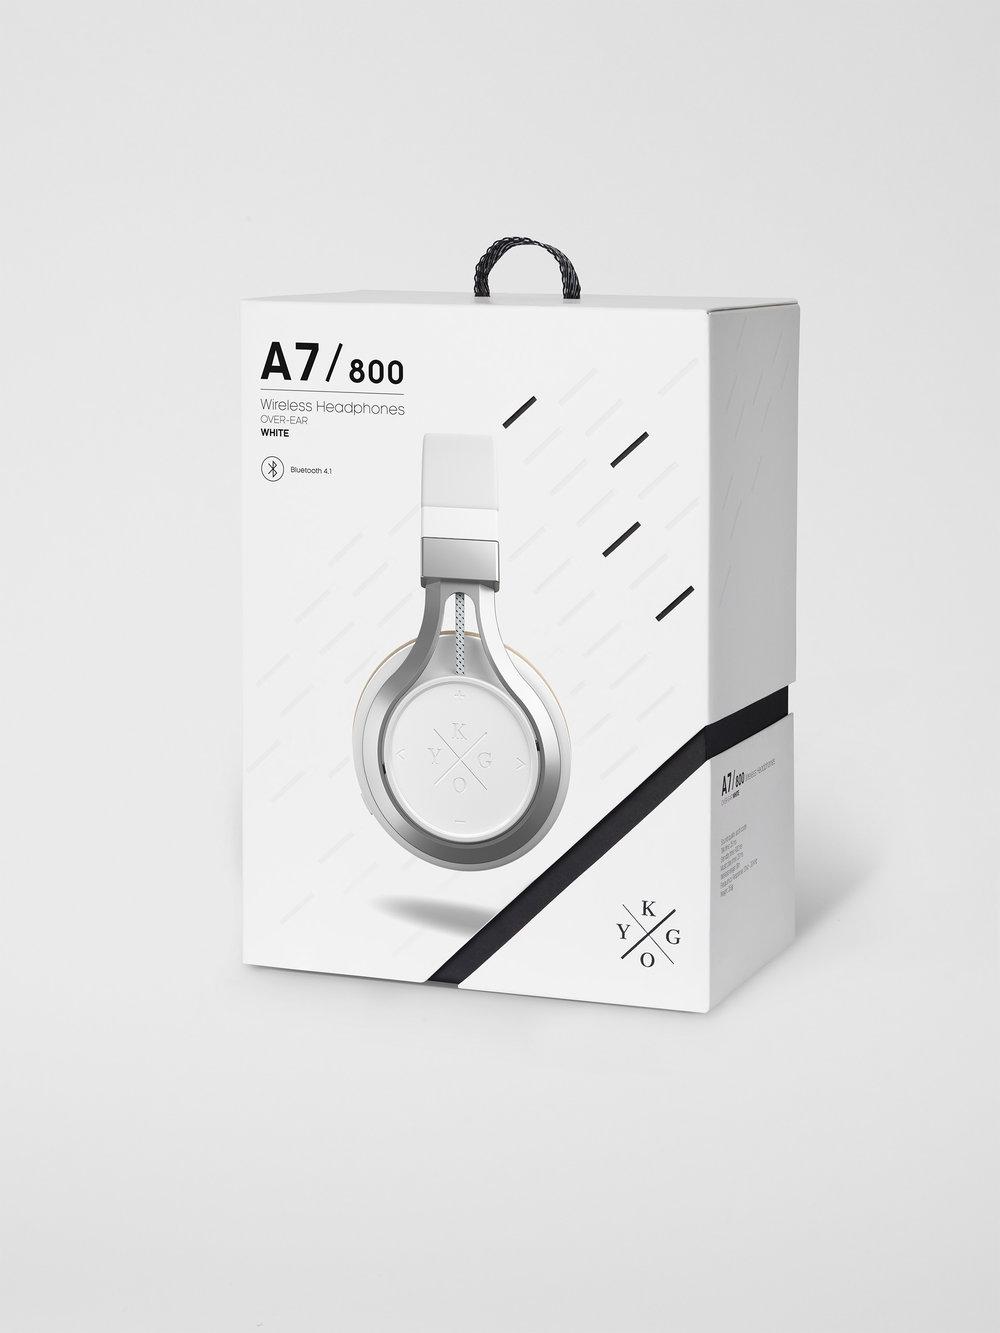 Produktbilde - Packshot - Produktfotograf i Oslo. Kygo Øretelefoner.